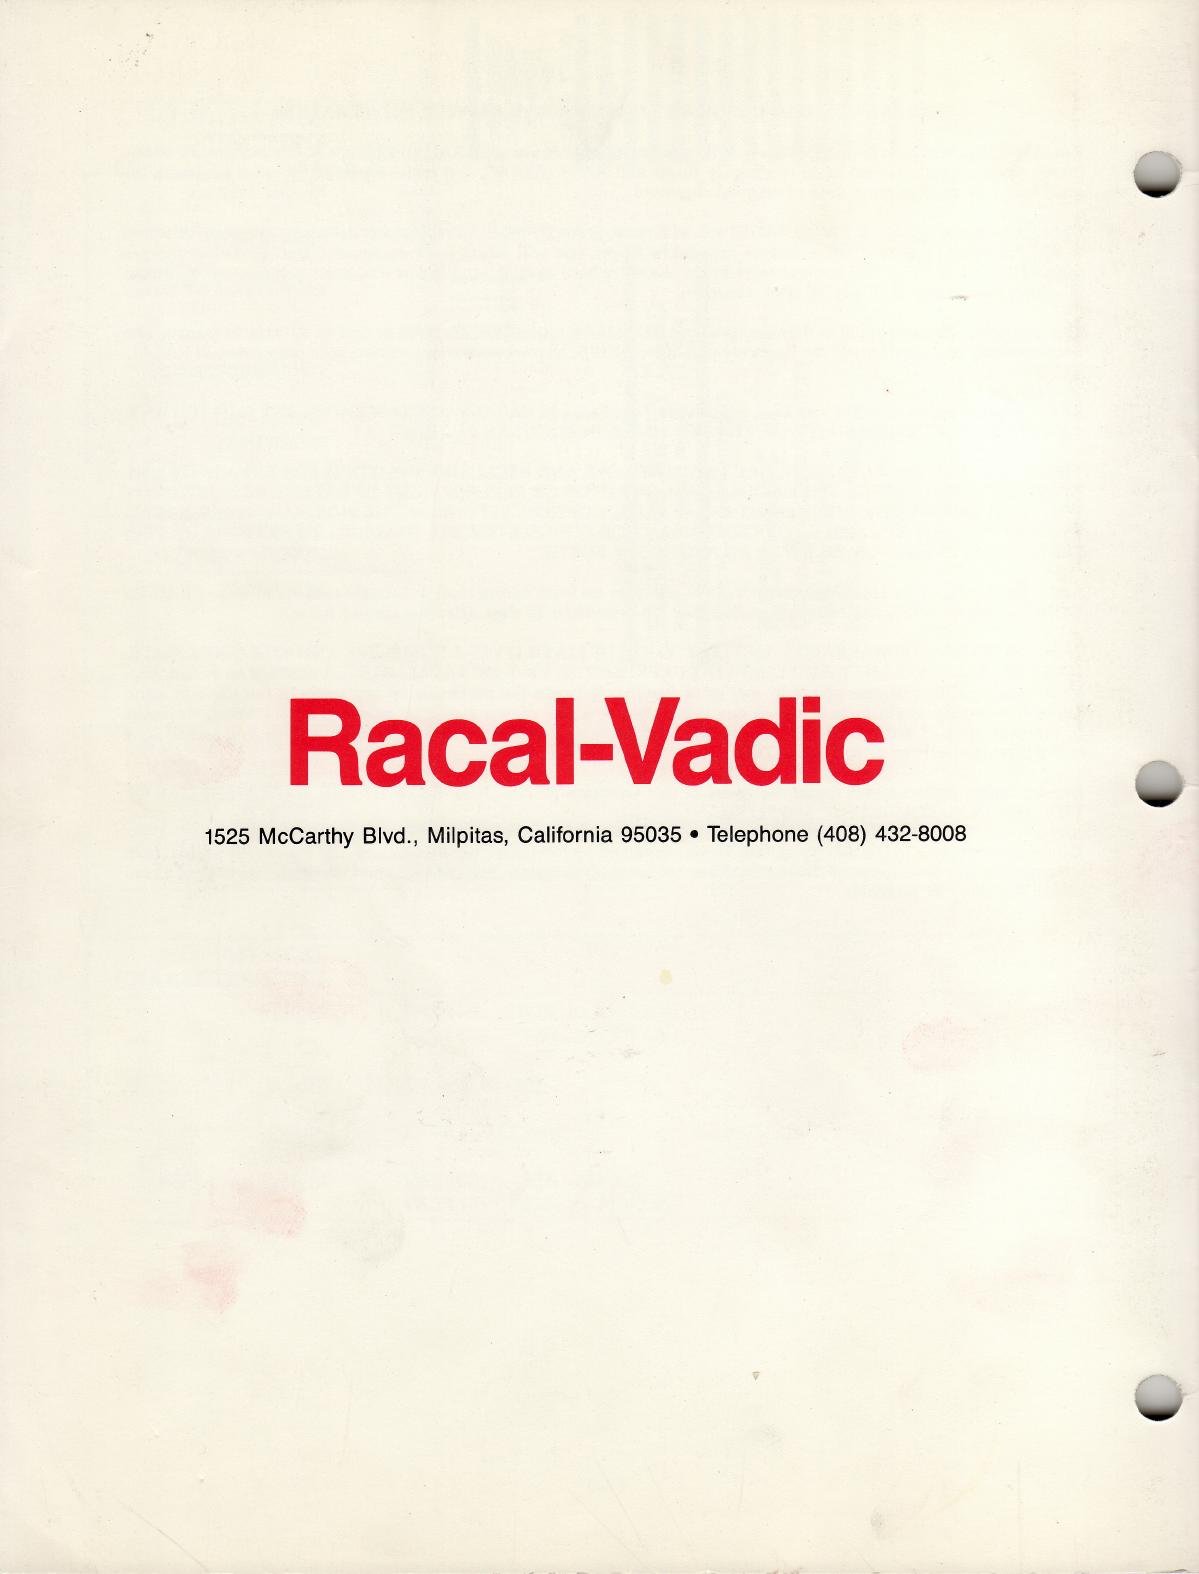 Racal Vadic_18008 067_VA2440